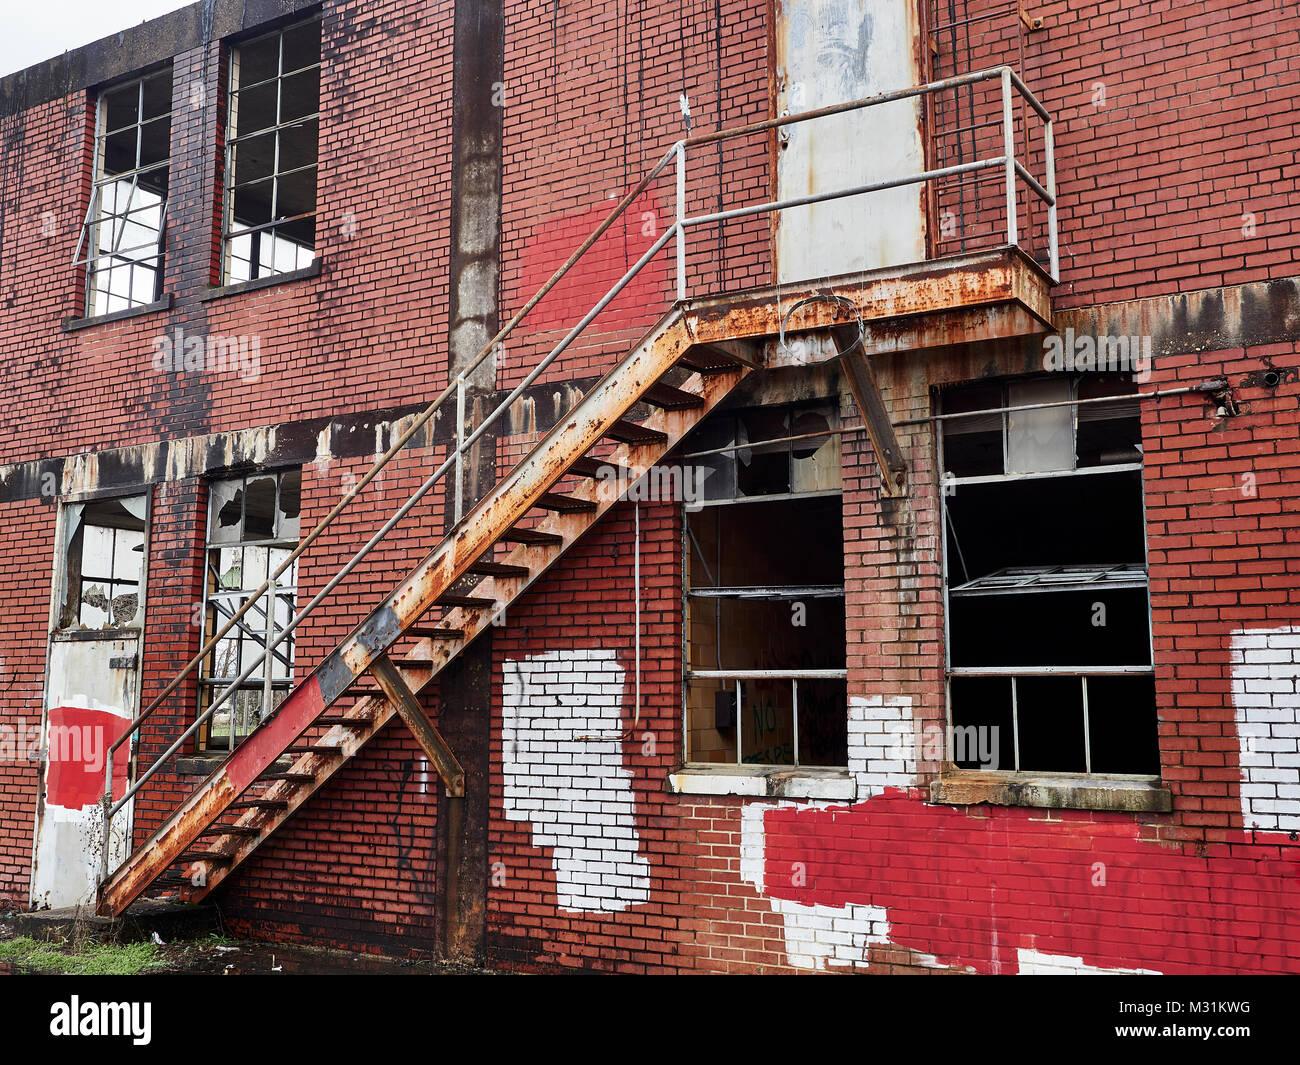 Run Down Urban Decay Stock Photos & Run Down Urban Decay